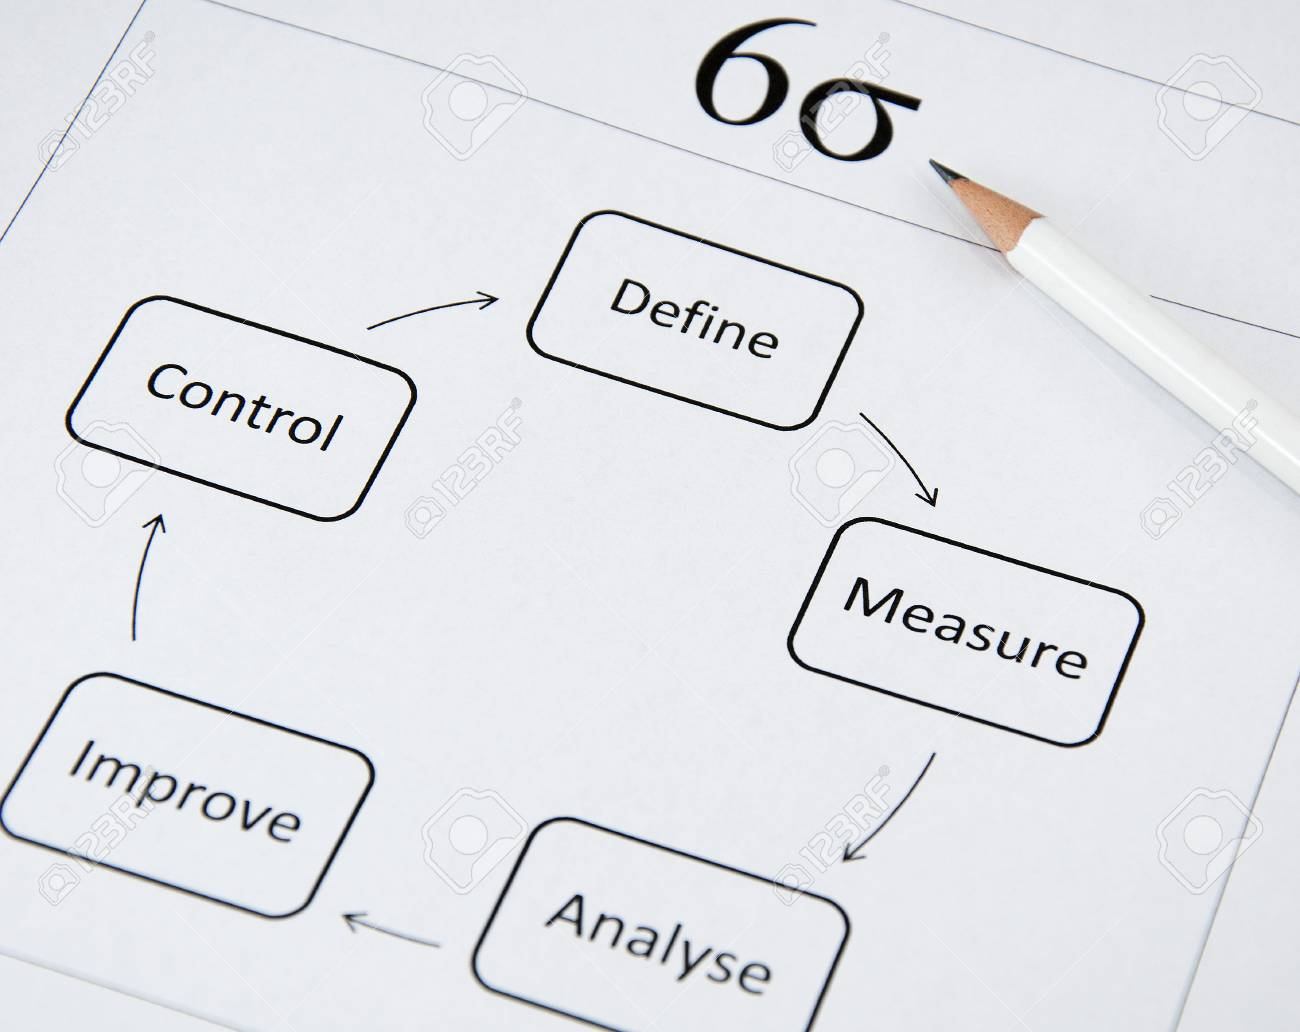 Six Sigma: The popular business improvement concept - 113716363